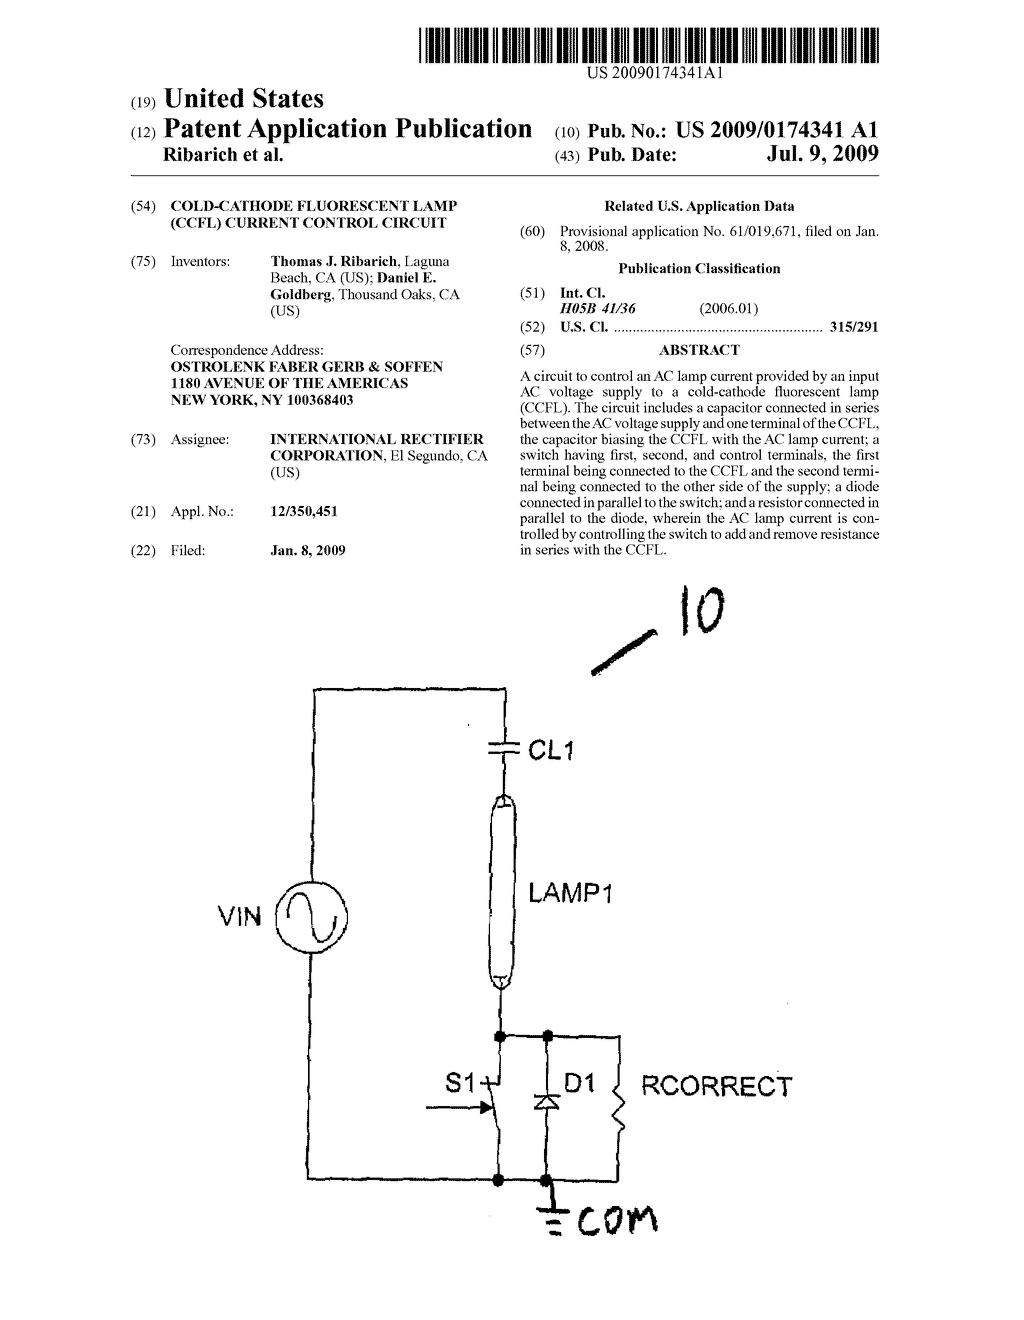 Cold Cathode Fluorescent Lamp Ccfl Current Control Circuit Diagram Schematic And Image 01